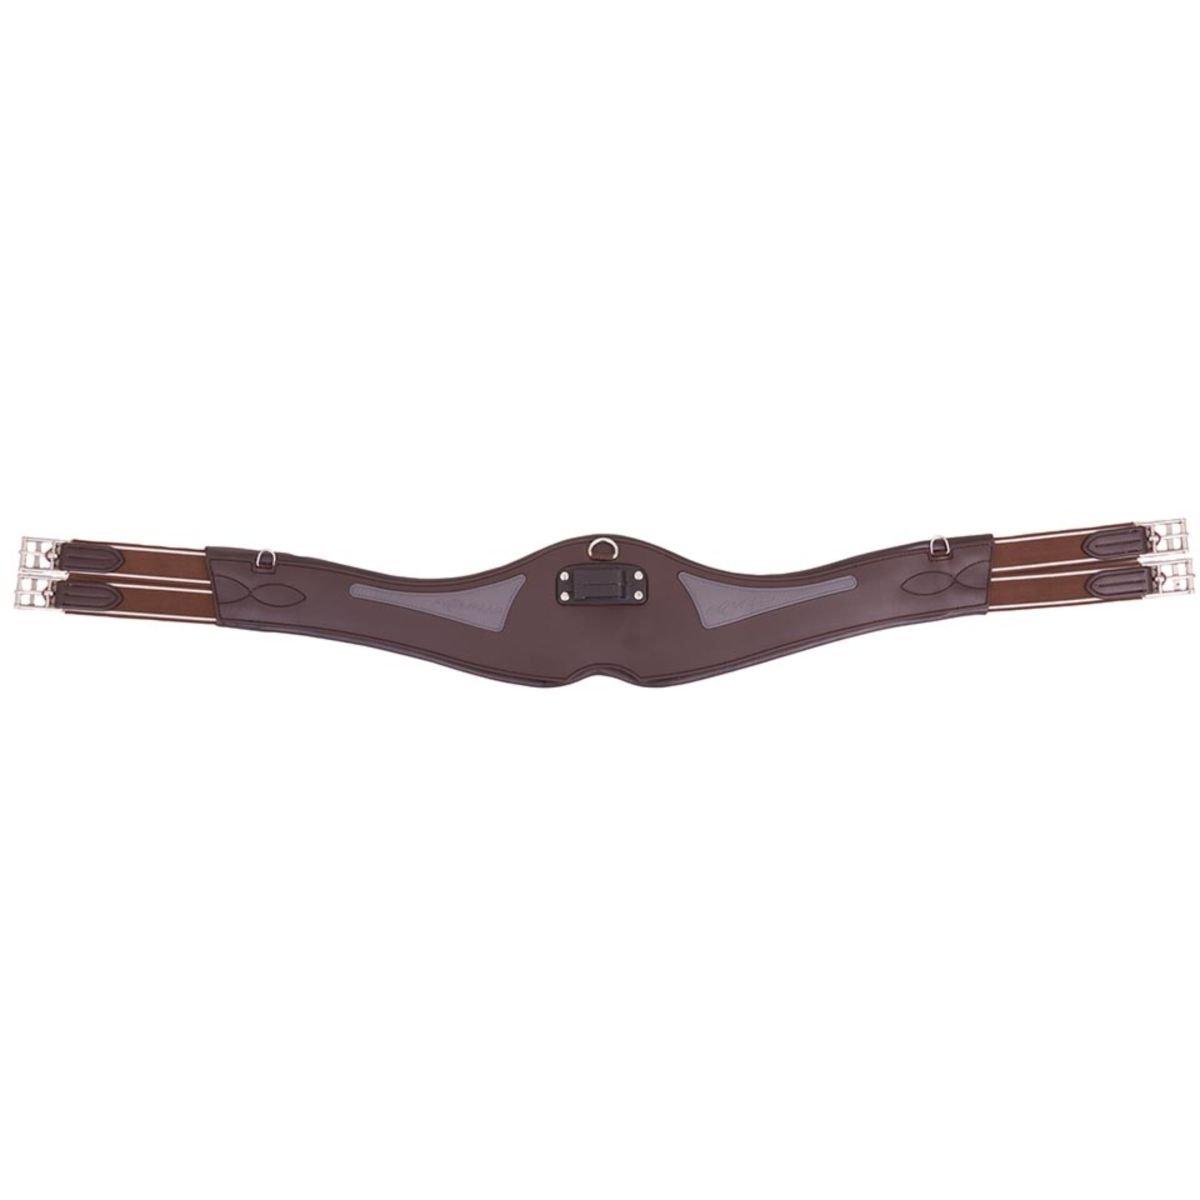 Imagem de Acavallo Girth Comfort Gel Anatomic Brown 130cm